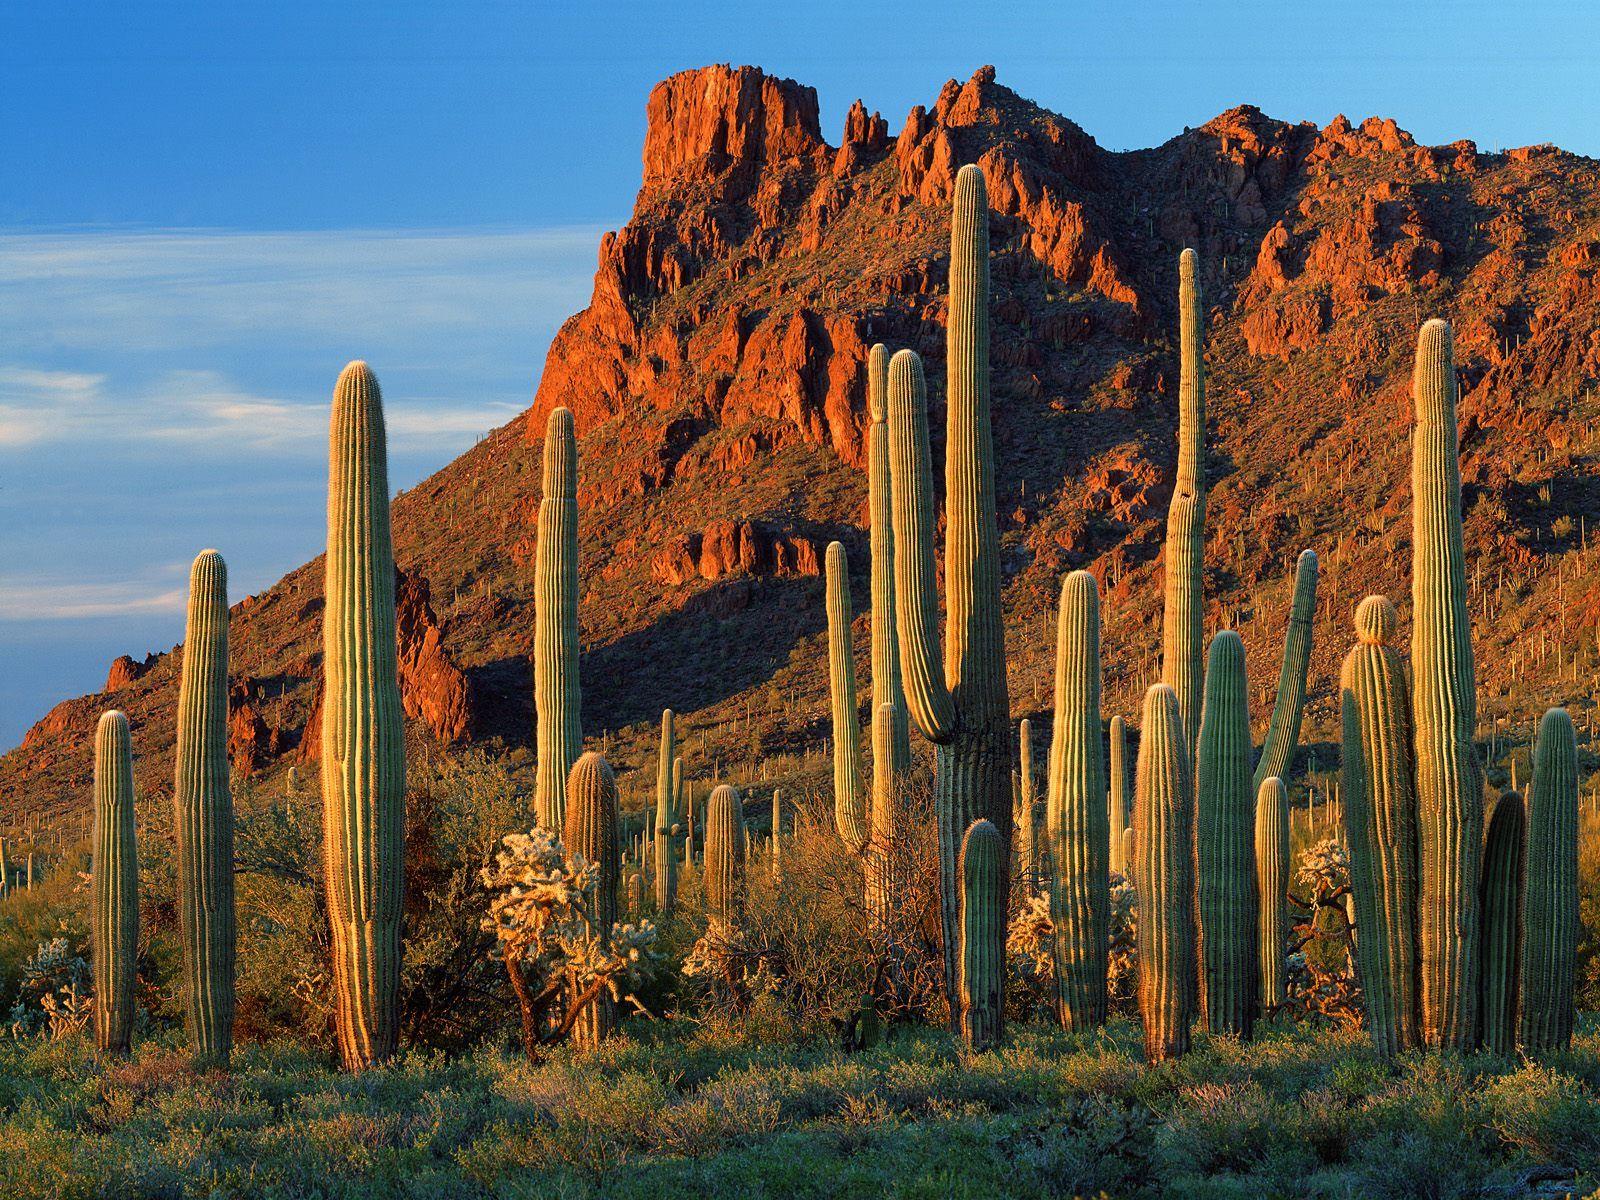 desert wallpaper cactus hd - photo #5